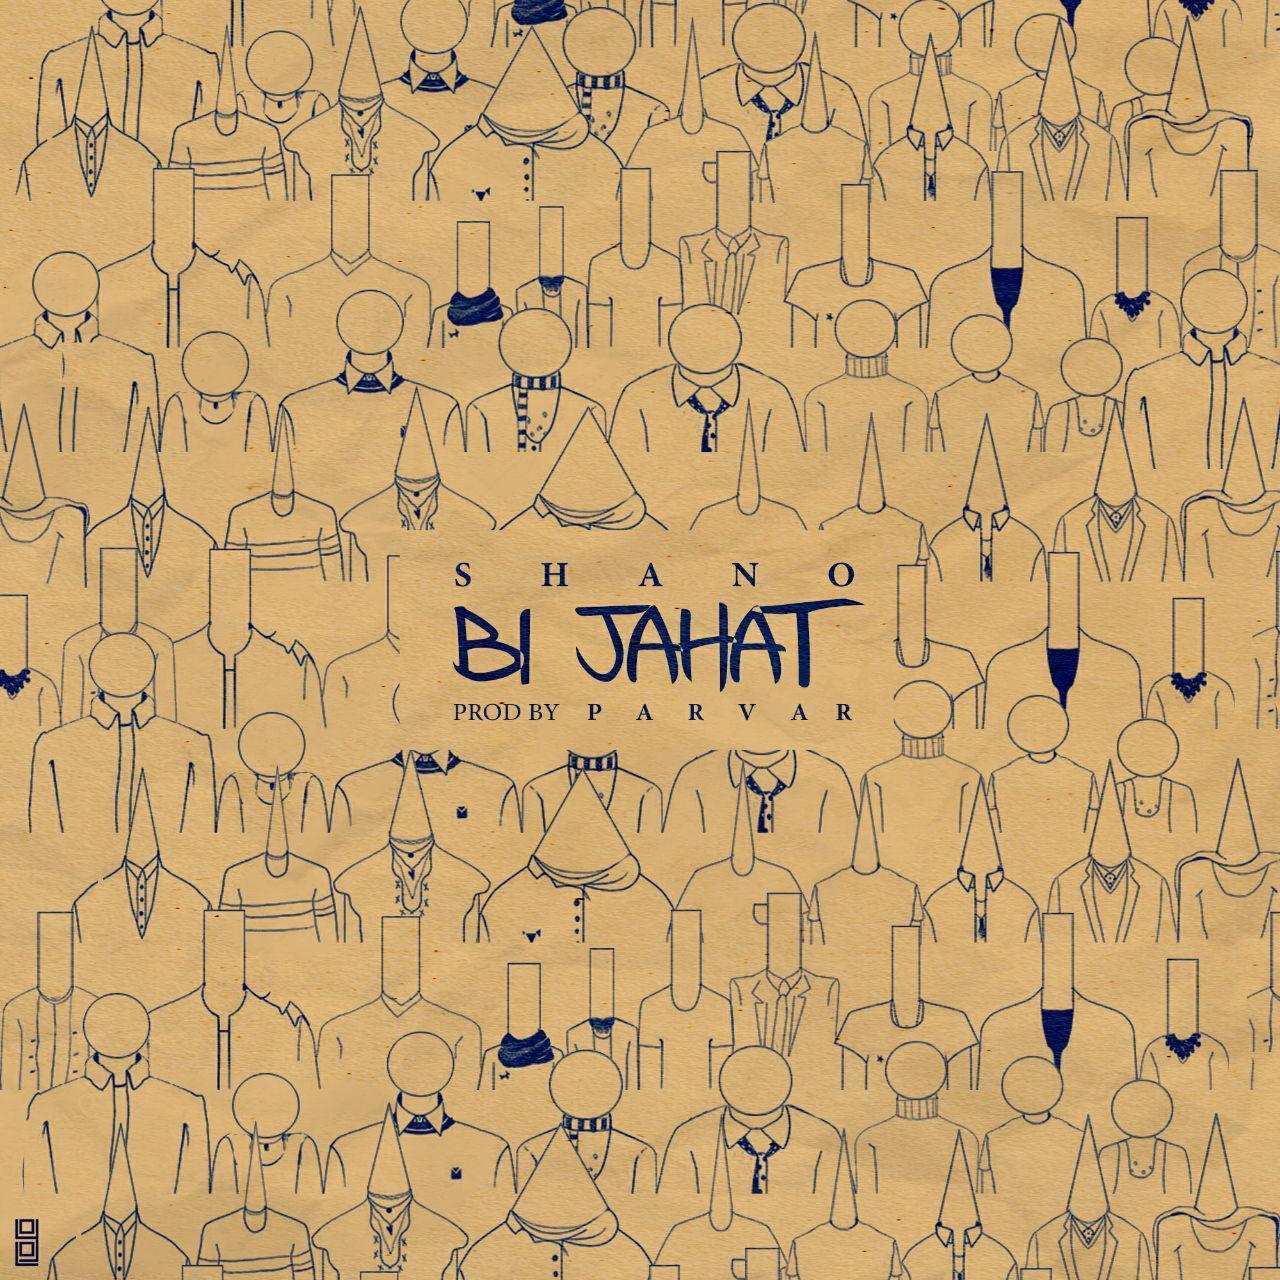 Bi Jahat